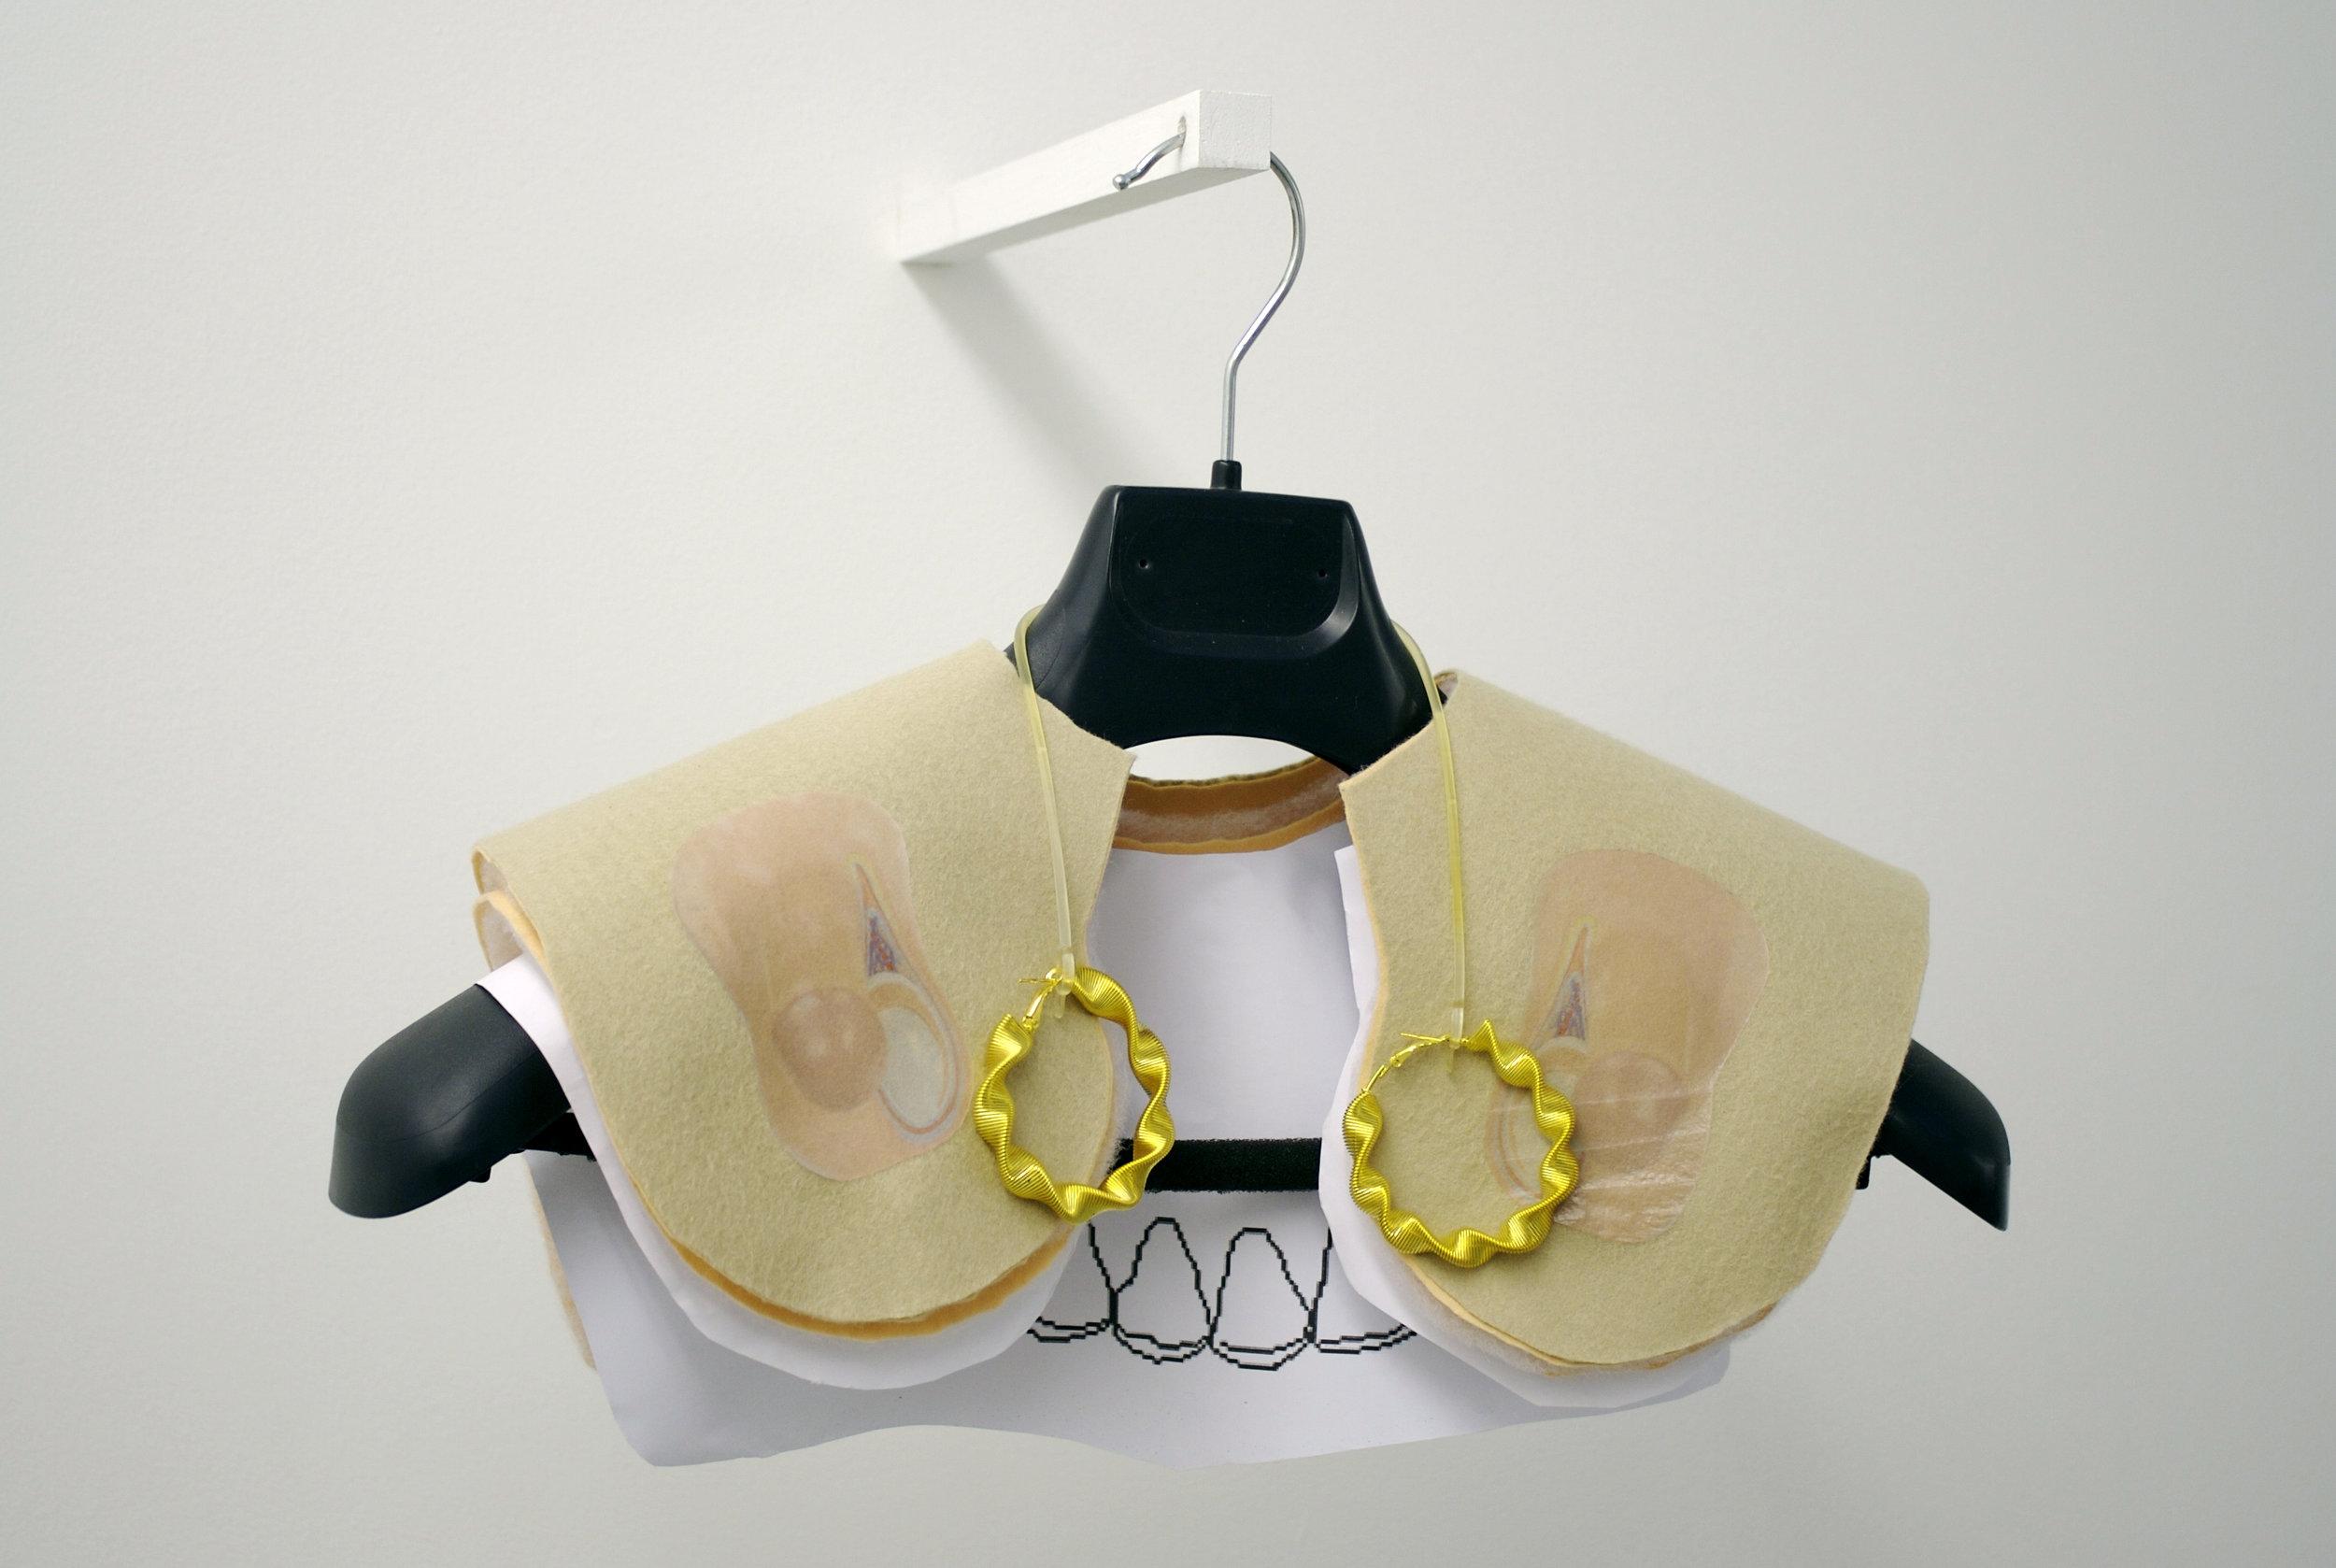 Bob Weight,  2011, Synthetic felt, Wadding, Digital print, Suit Hanger, Earings.